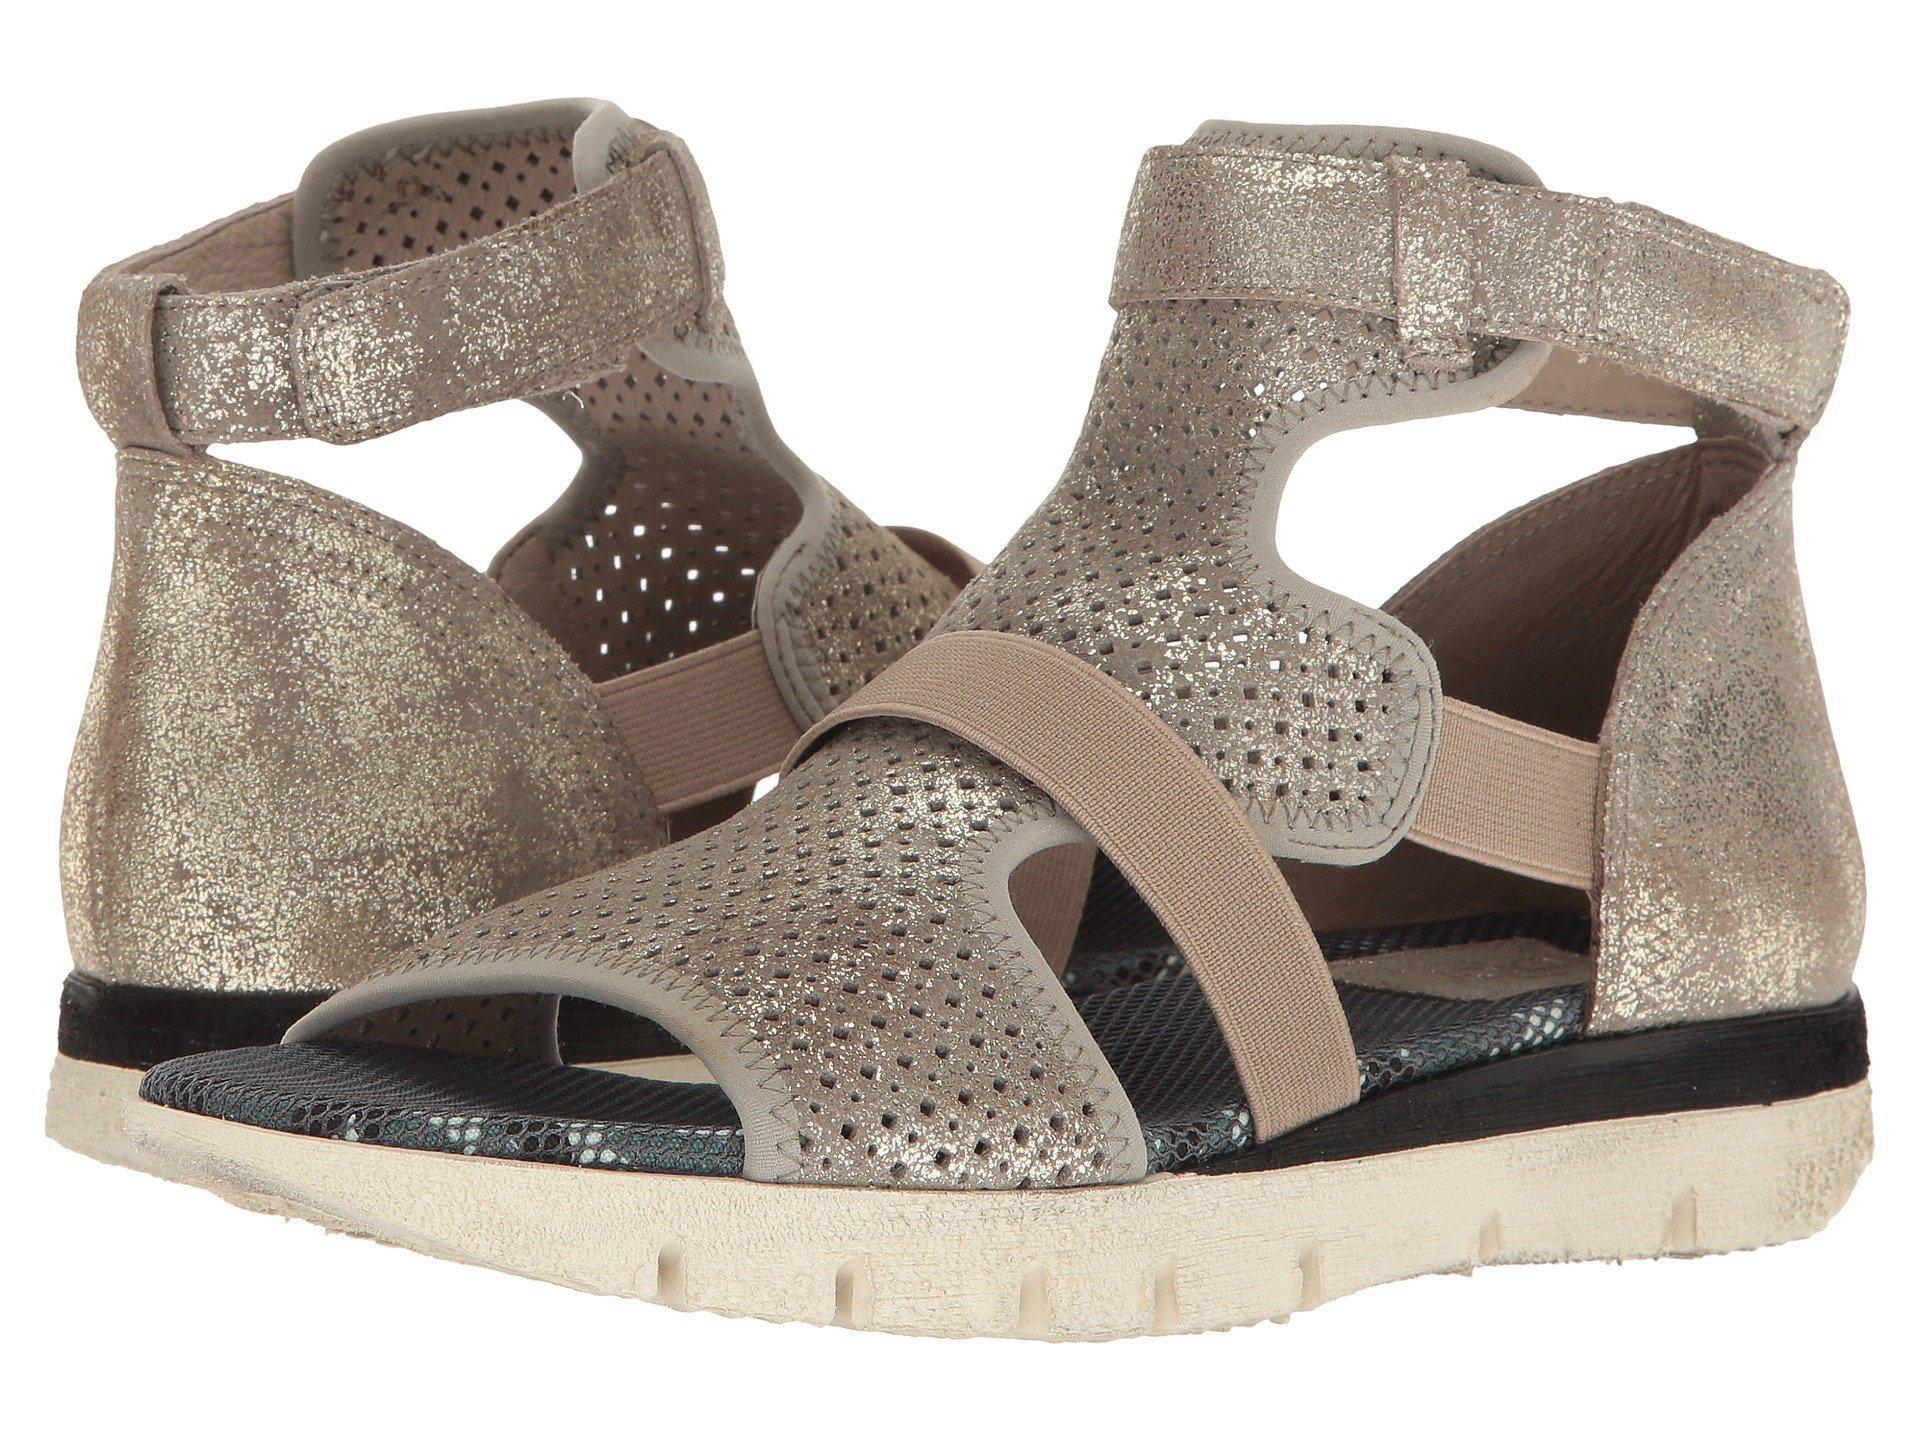 7a6f8a368f7 Lyst - Otbt Astro (black) Women s Sandals